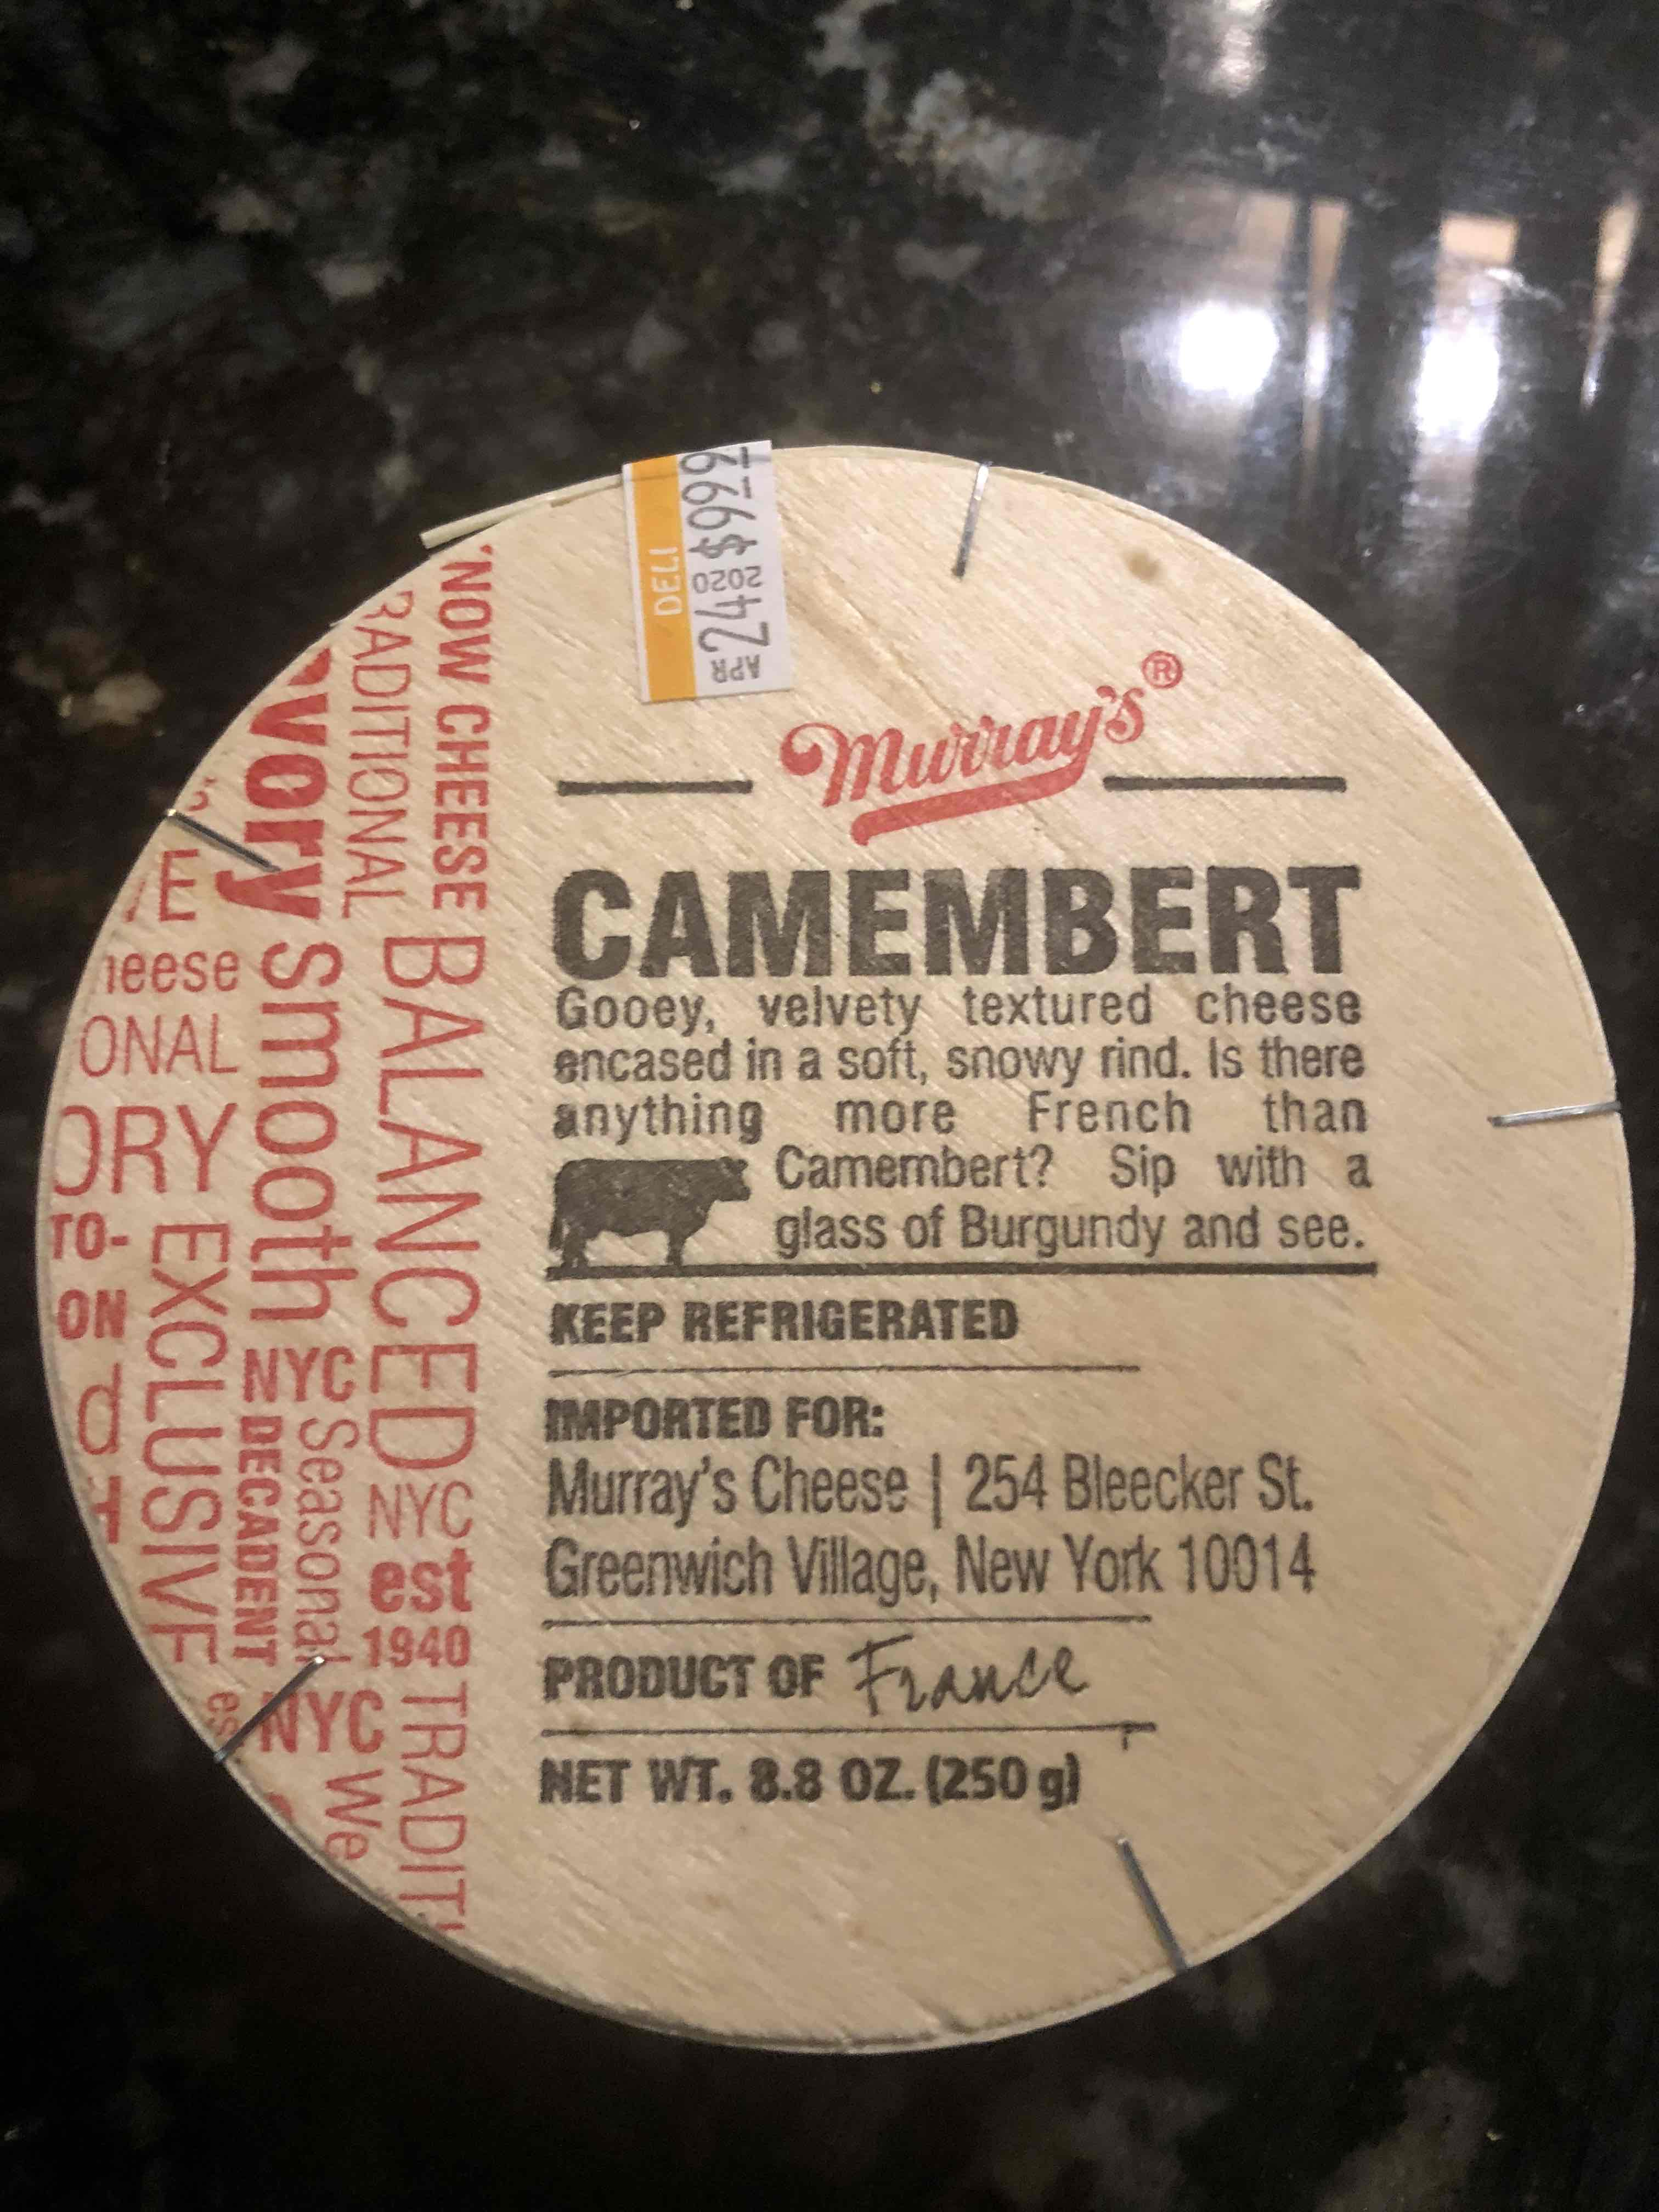 Murray's Camembert